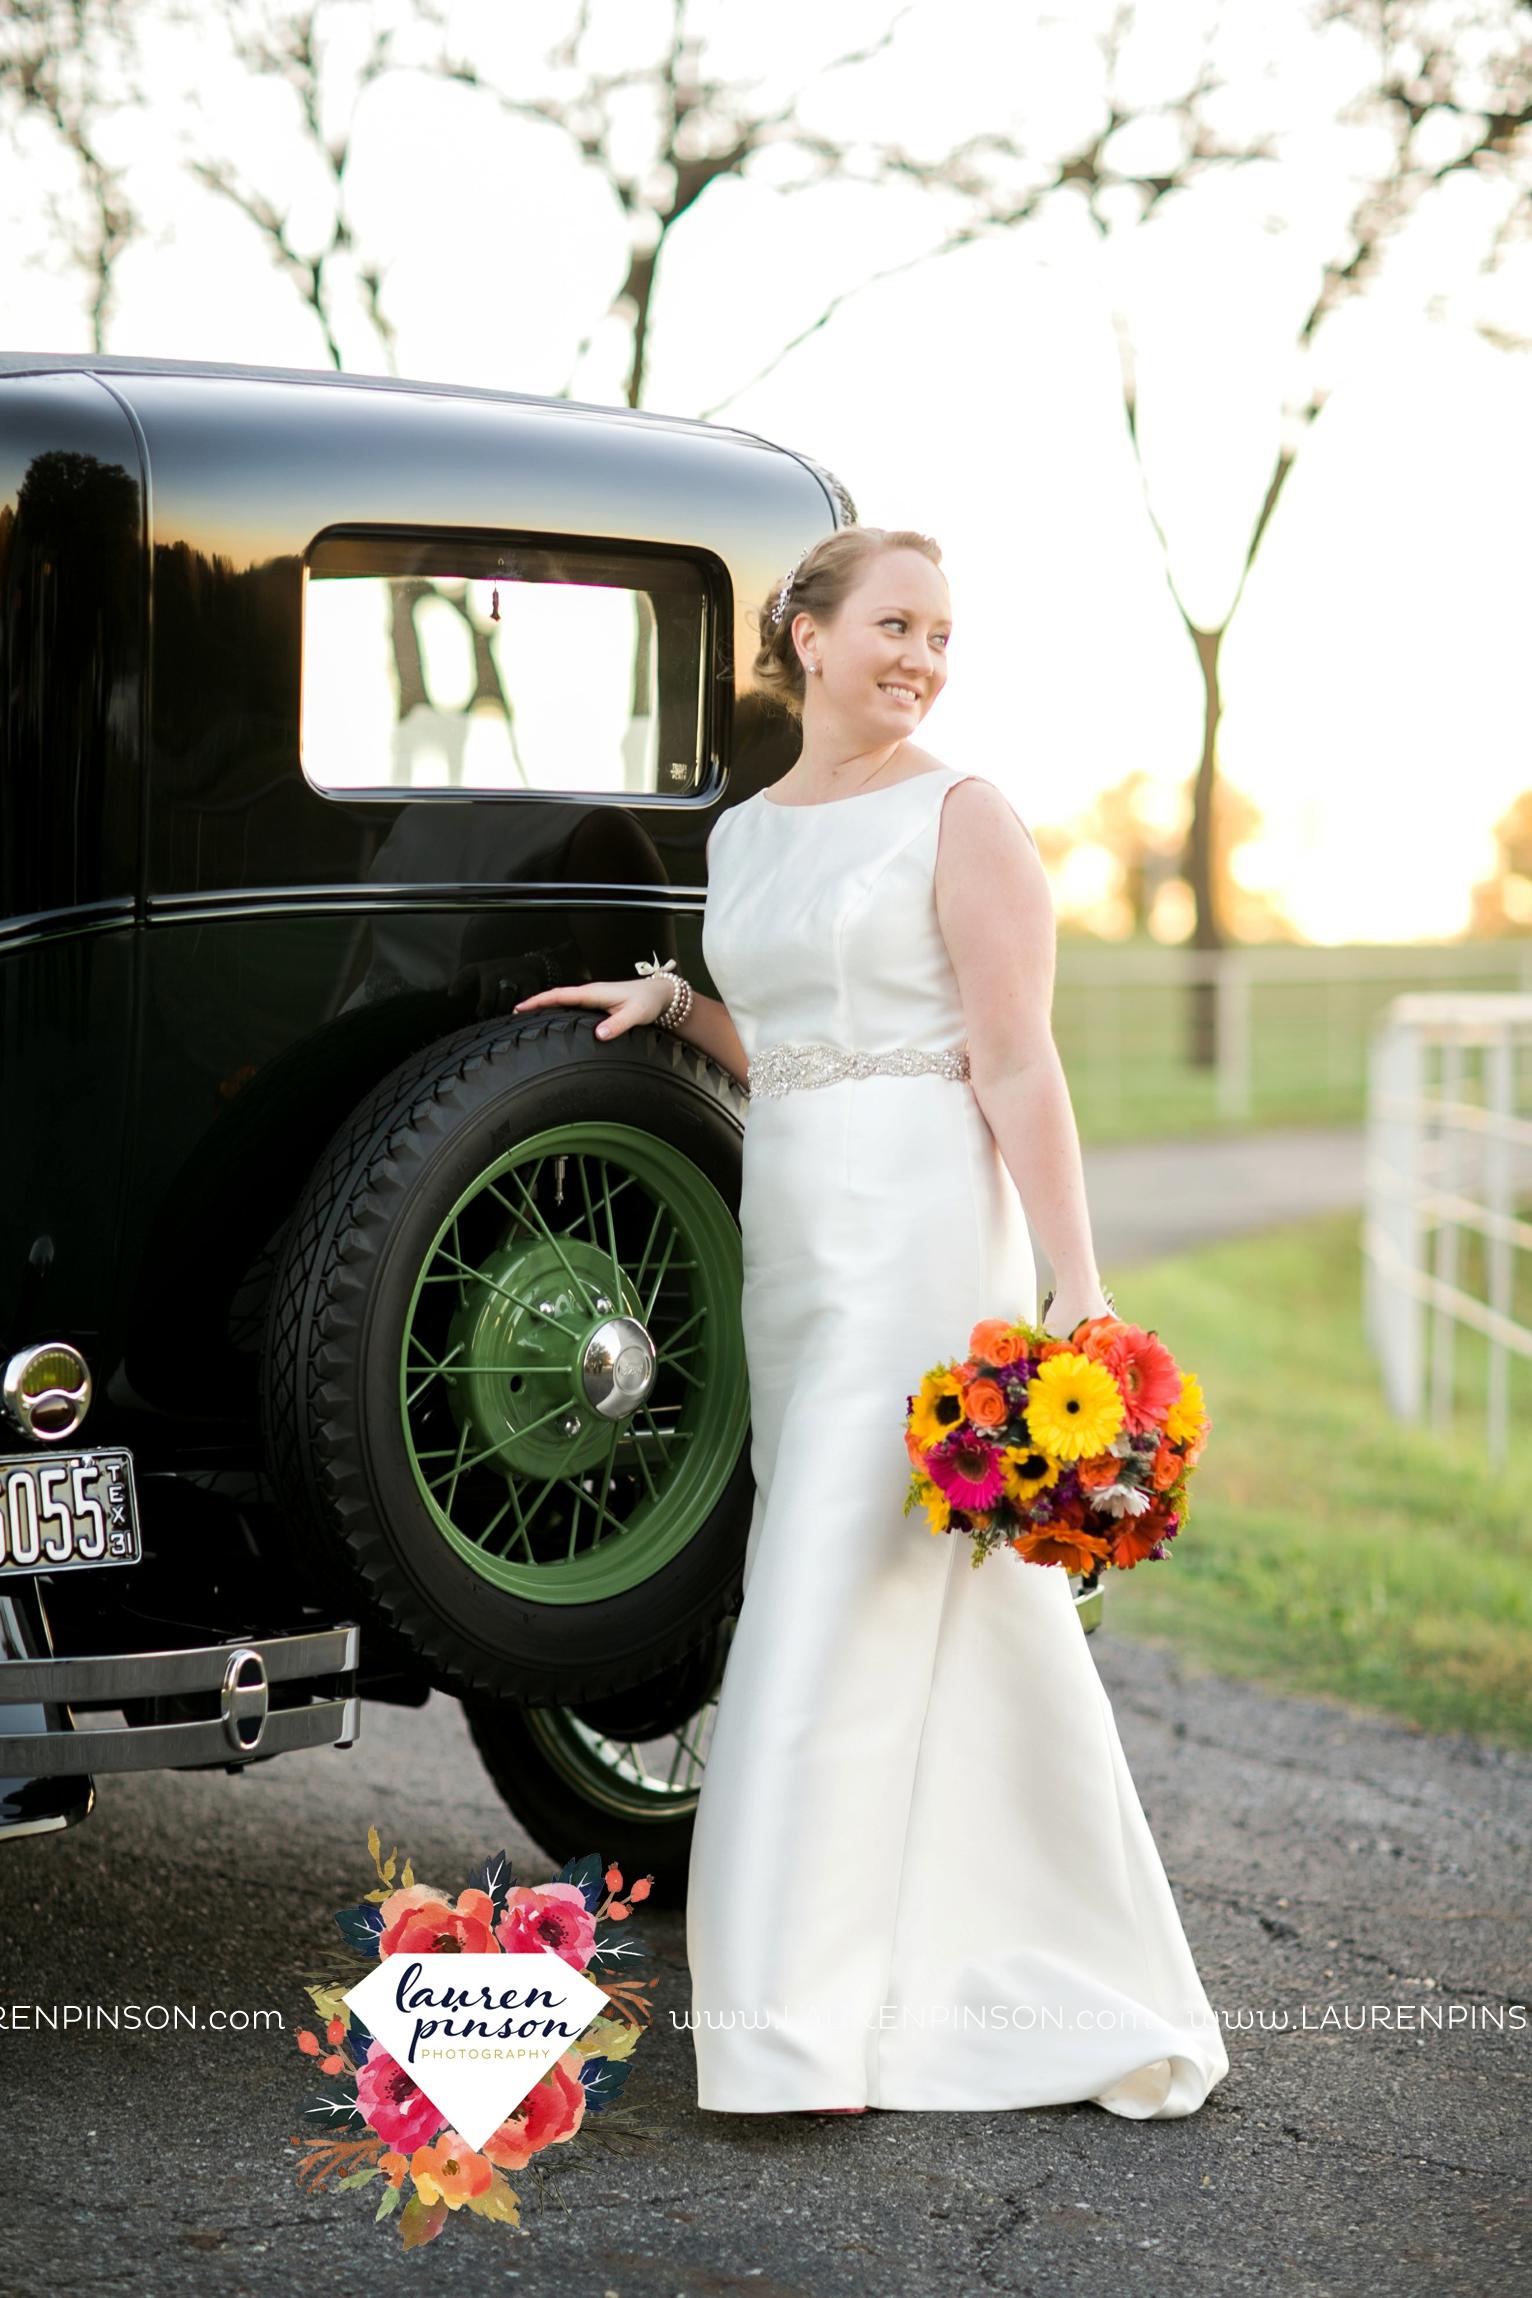 bells-texas-wedding-photography-at-willowood-ranch-chapel-north-texas-wichita-falls-wedding-photographer_1837.jpg